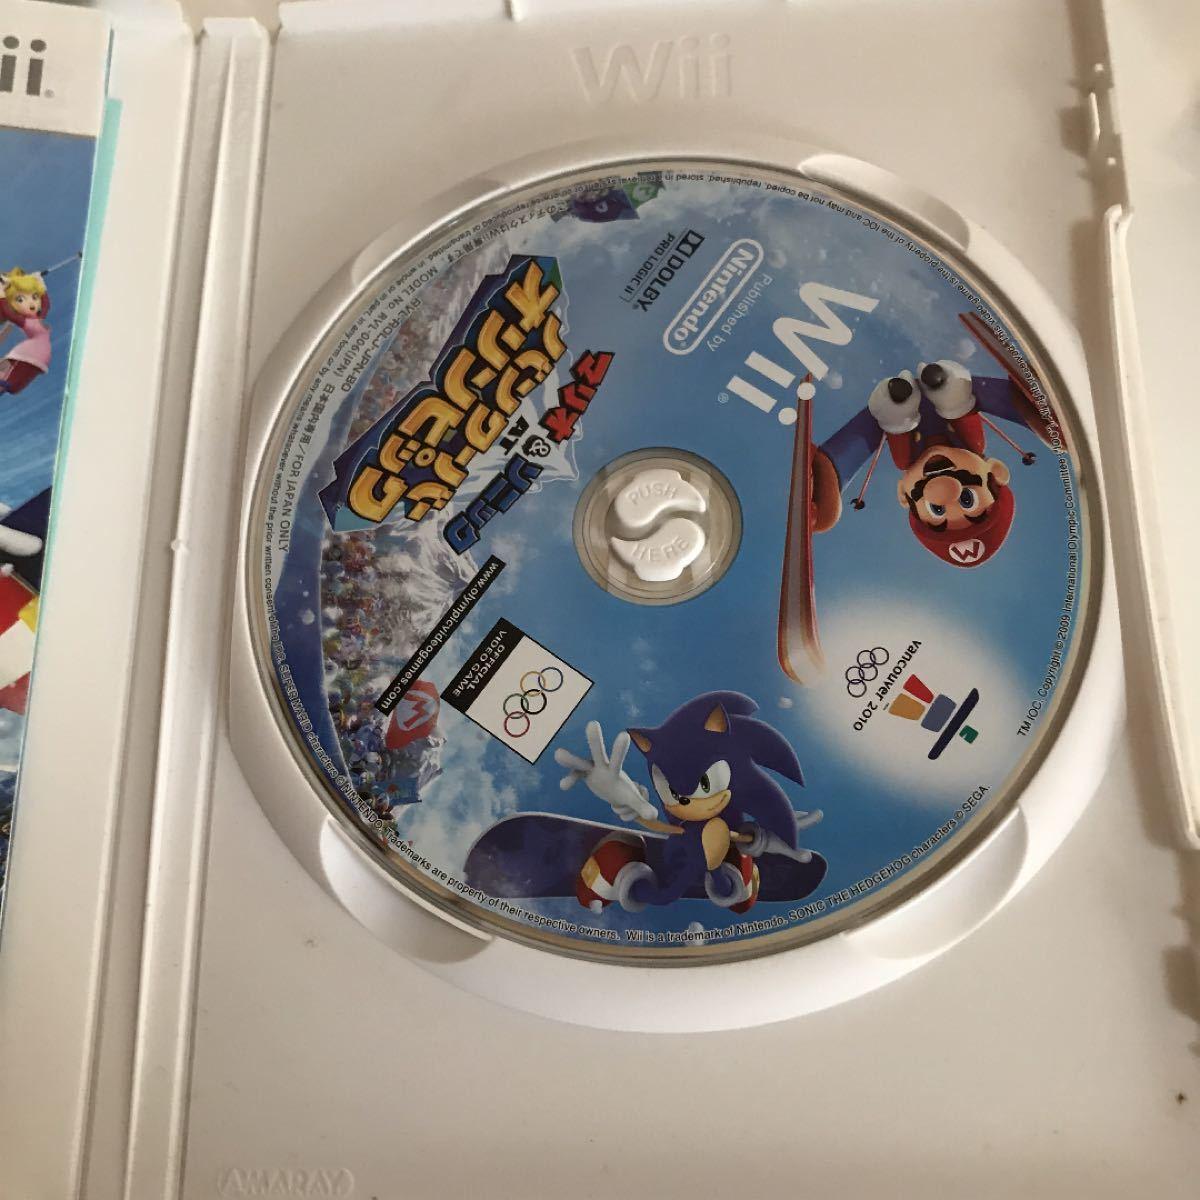 【Wii】 マリオ&ソニック AT バンクーバーオリンピック